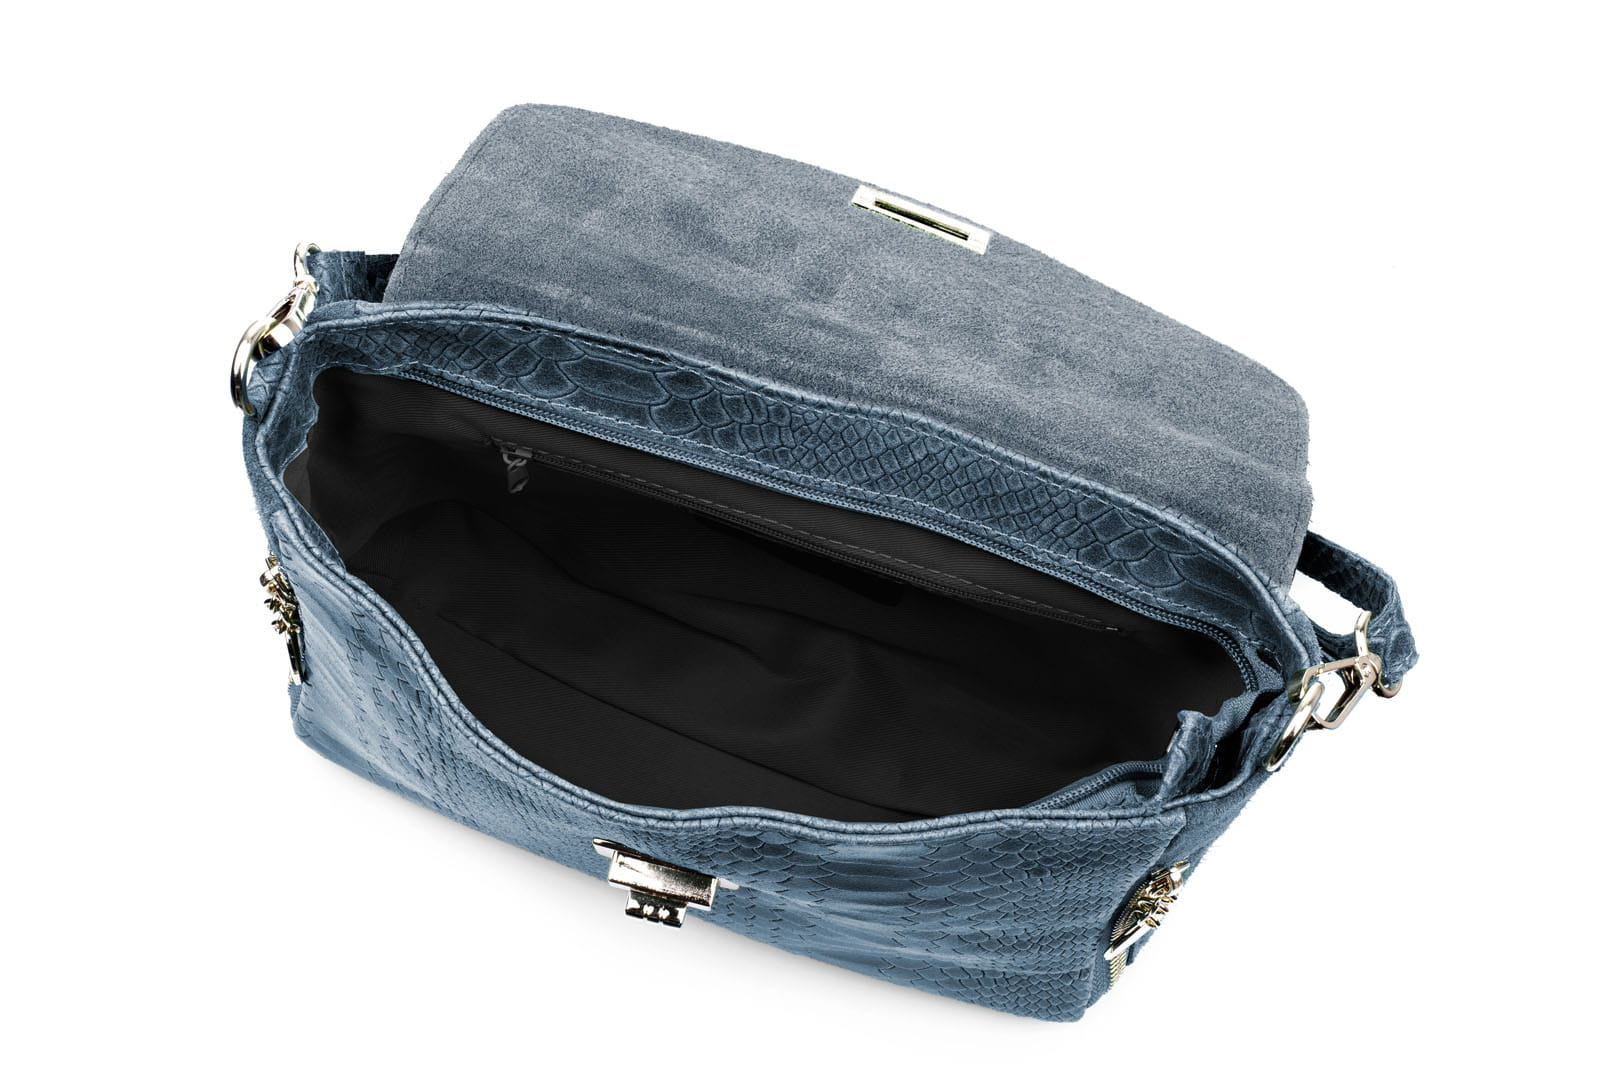 38d2a2c9861a8 Torebka Damska Skórzana Vera Pelle Łuski Jeansowa Leather Box